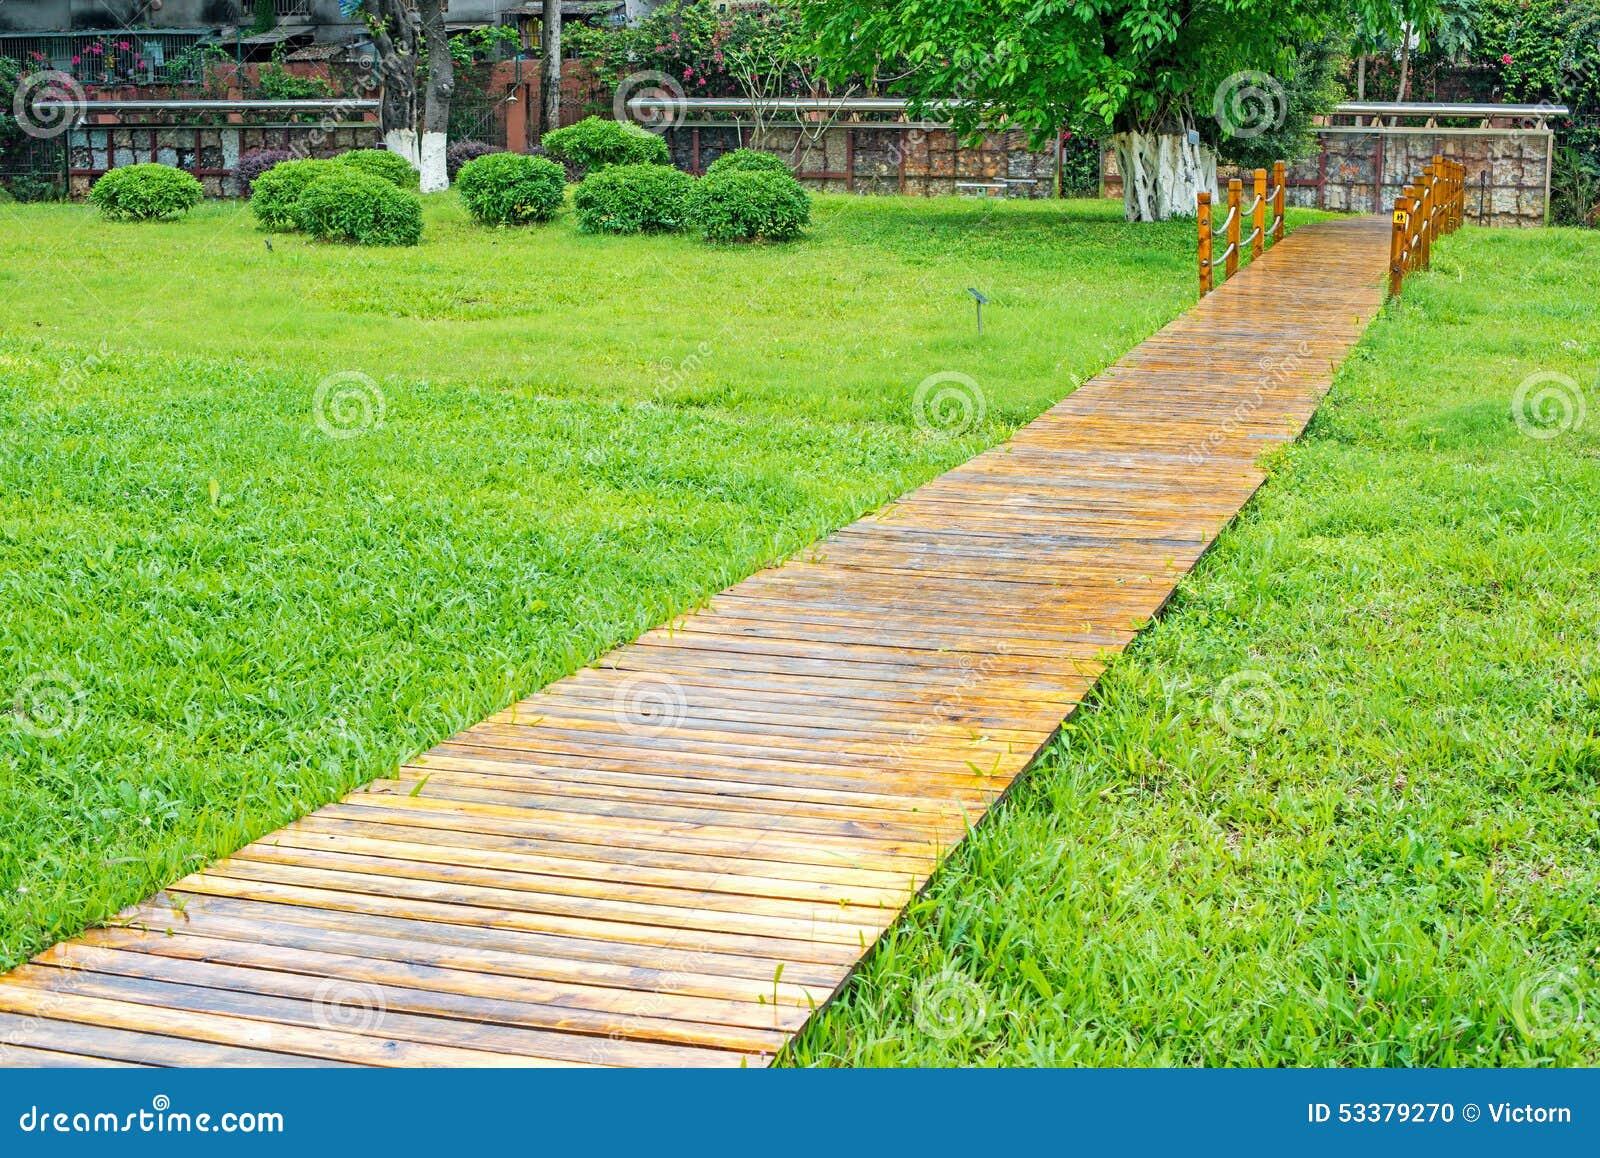 park pathway wood ...